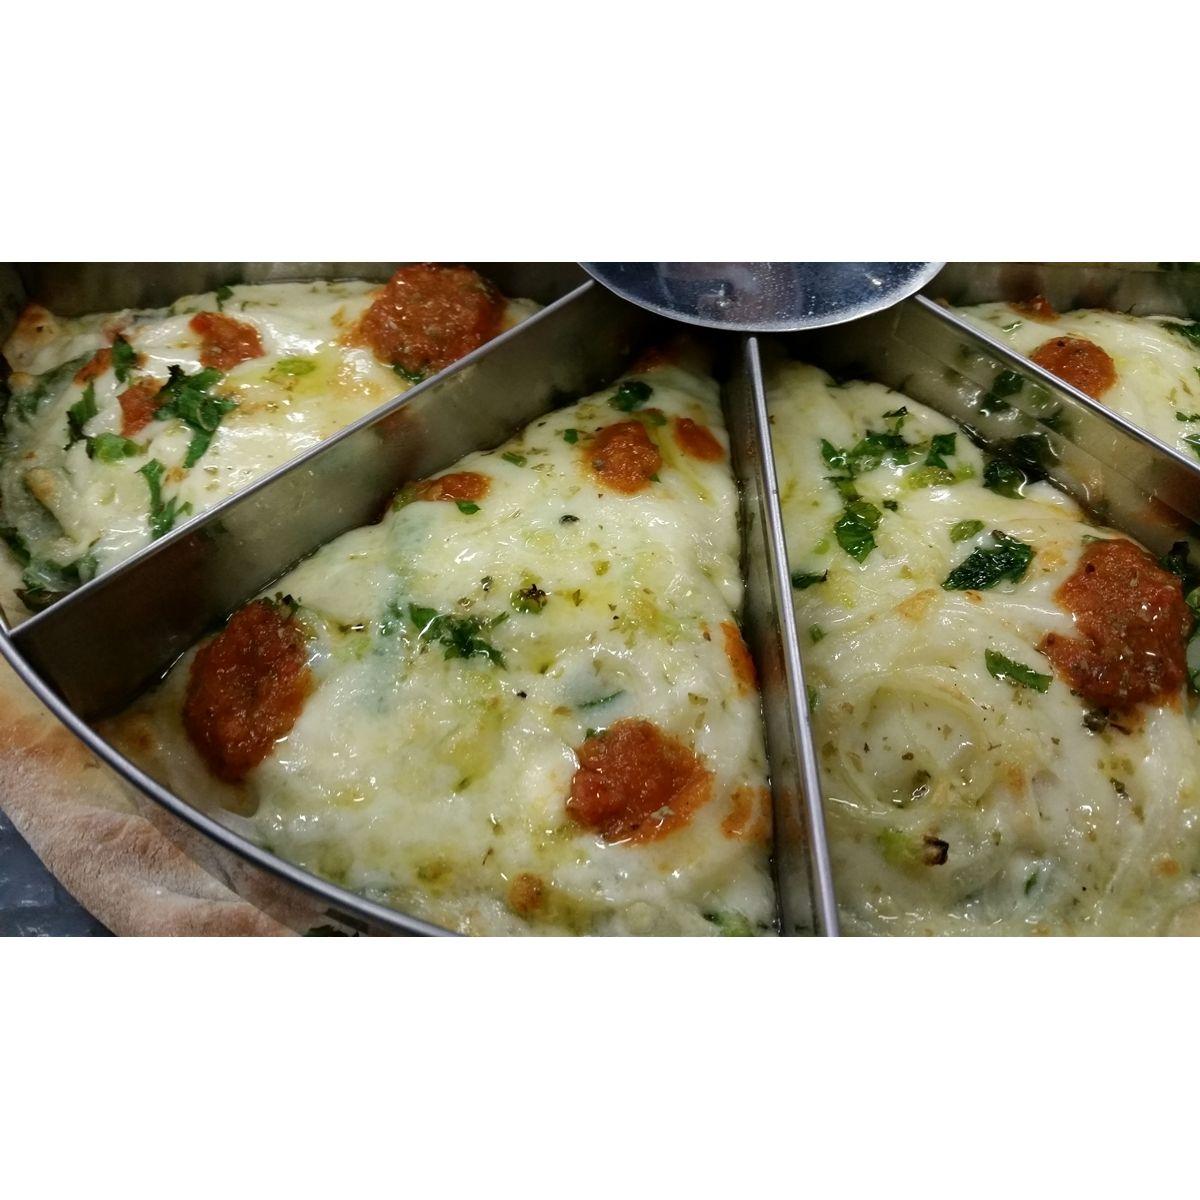 MARCADOR DE PIZZA 10 PEDA�OS P/ PIZZAS DE 38/40 CM  - F�rum de Pizzas Vendas online